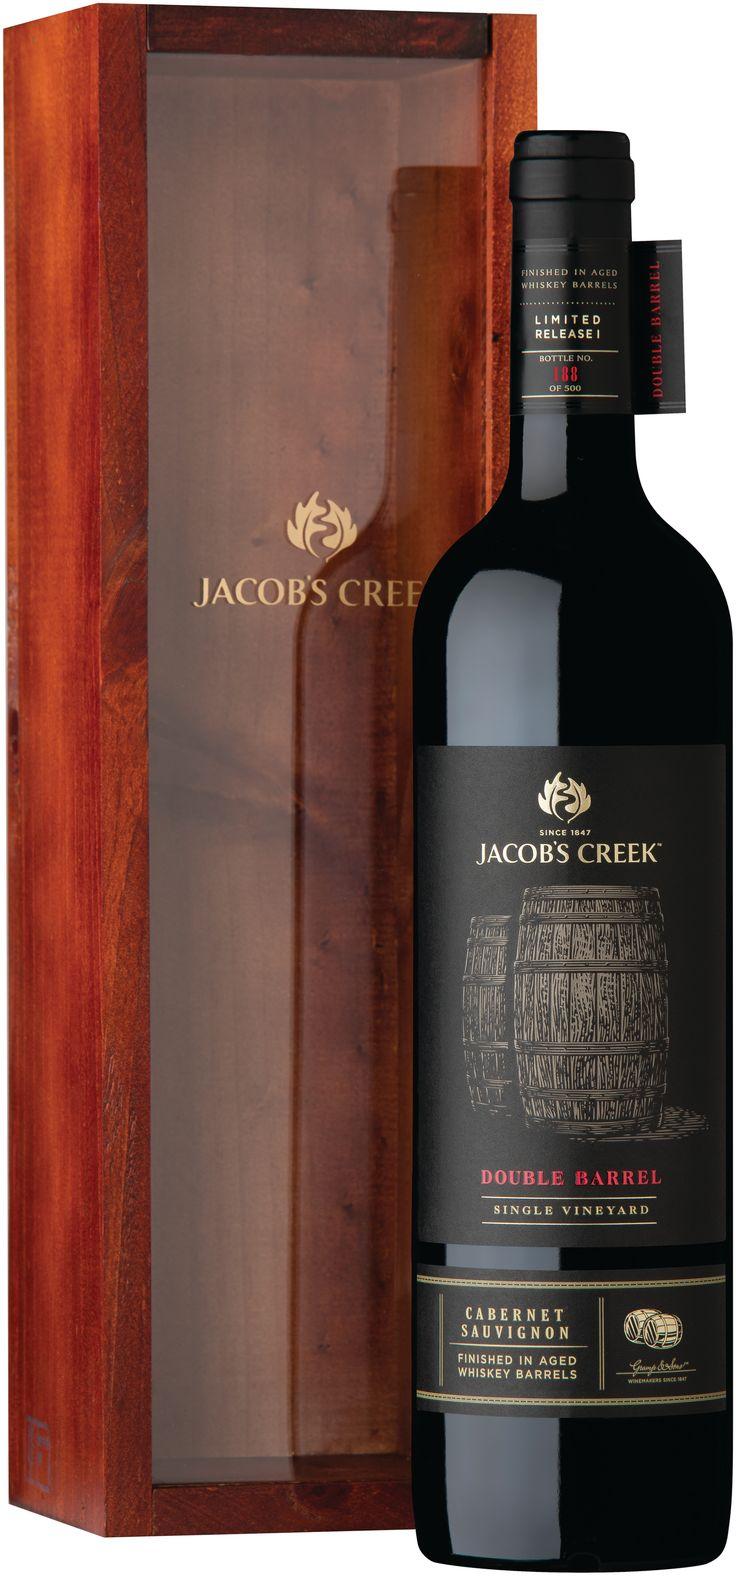 Australian wine brand JACOB'S CREEK™ launces two new limited releases exclusive to Pacific Travel Retail - JACOB'S CREEK Double Barrel Single Vineyard Shiraz and Cabernet Sauvignon